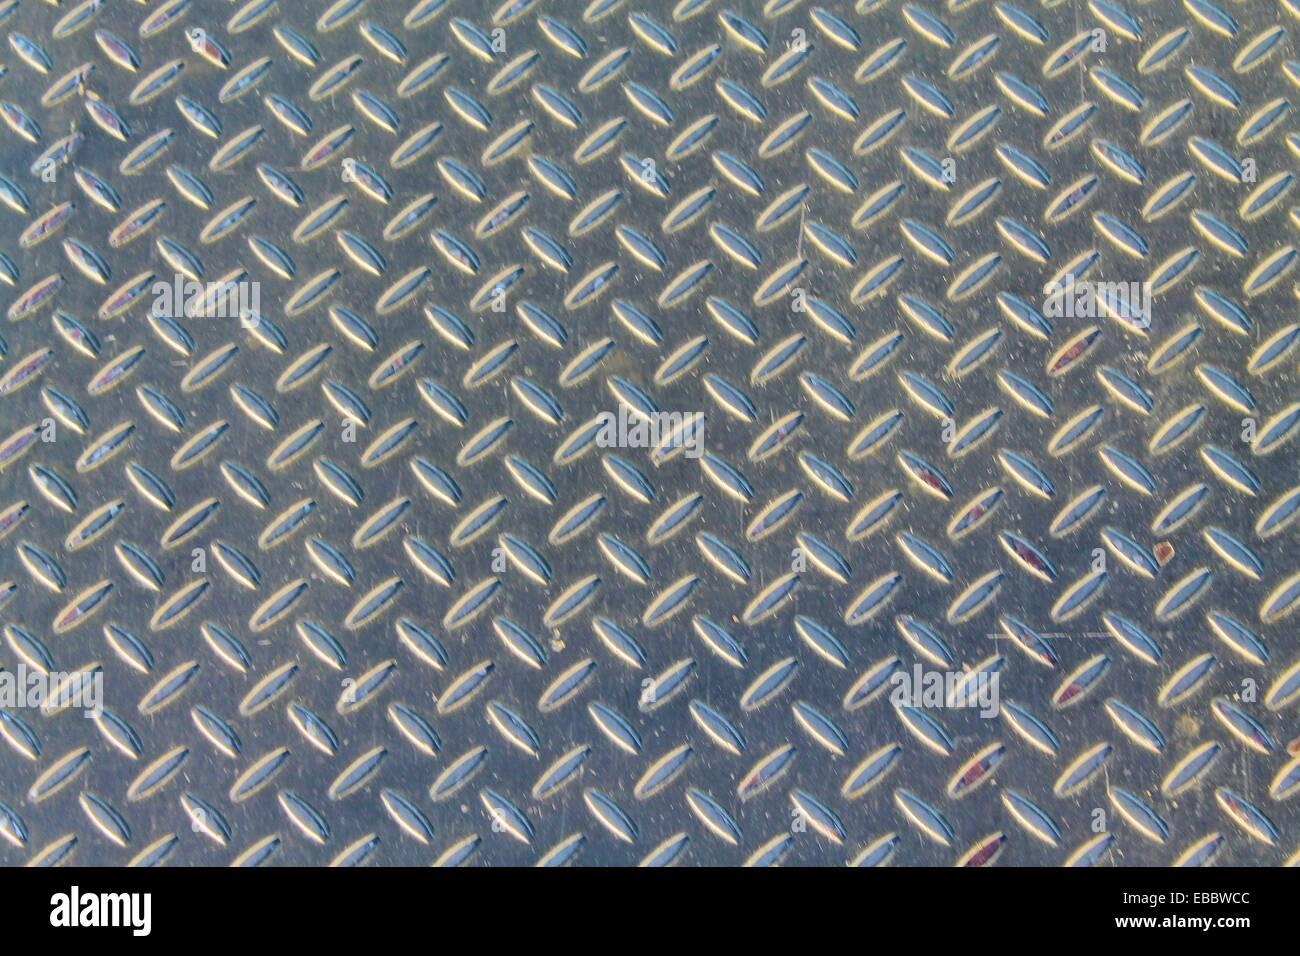 Non slip steel grating Stock Photo: 75864108 - Alamy